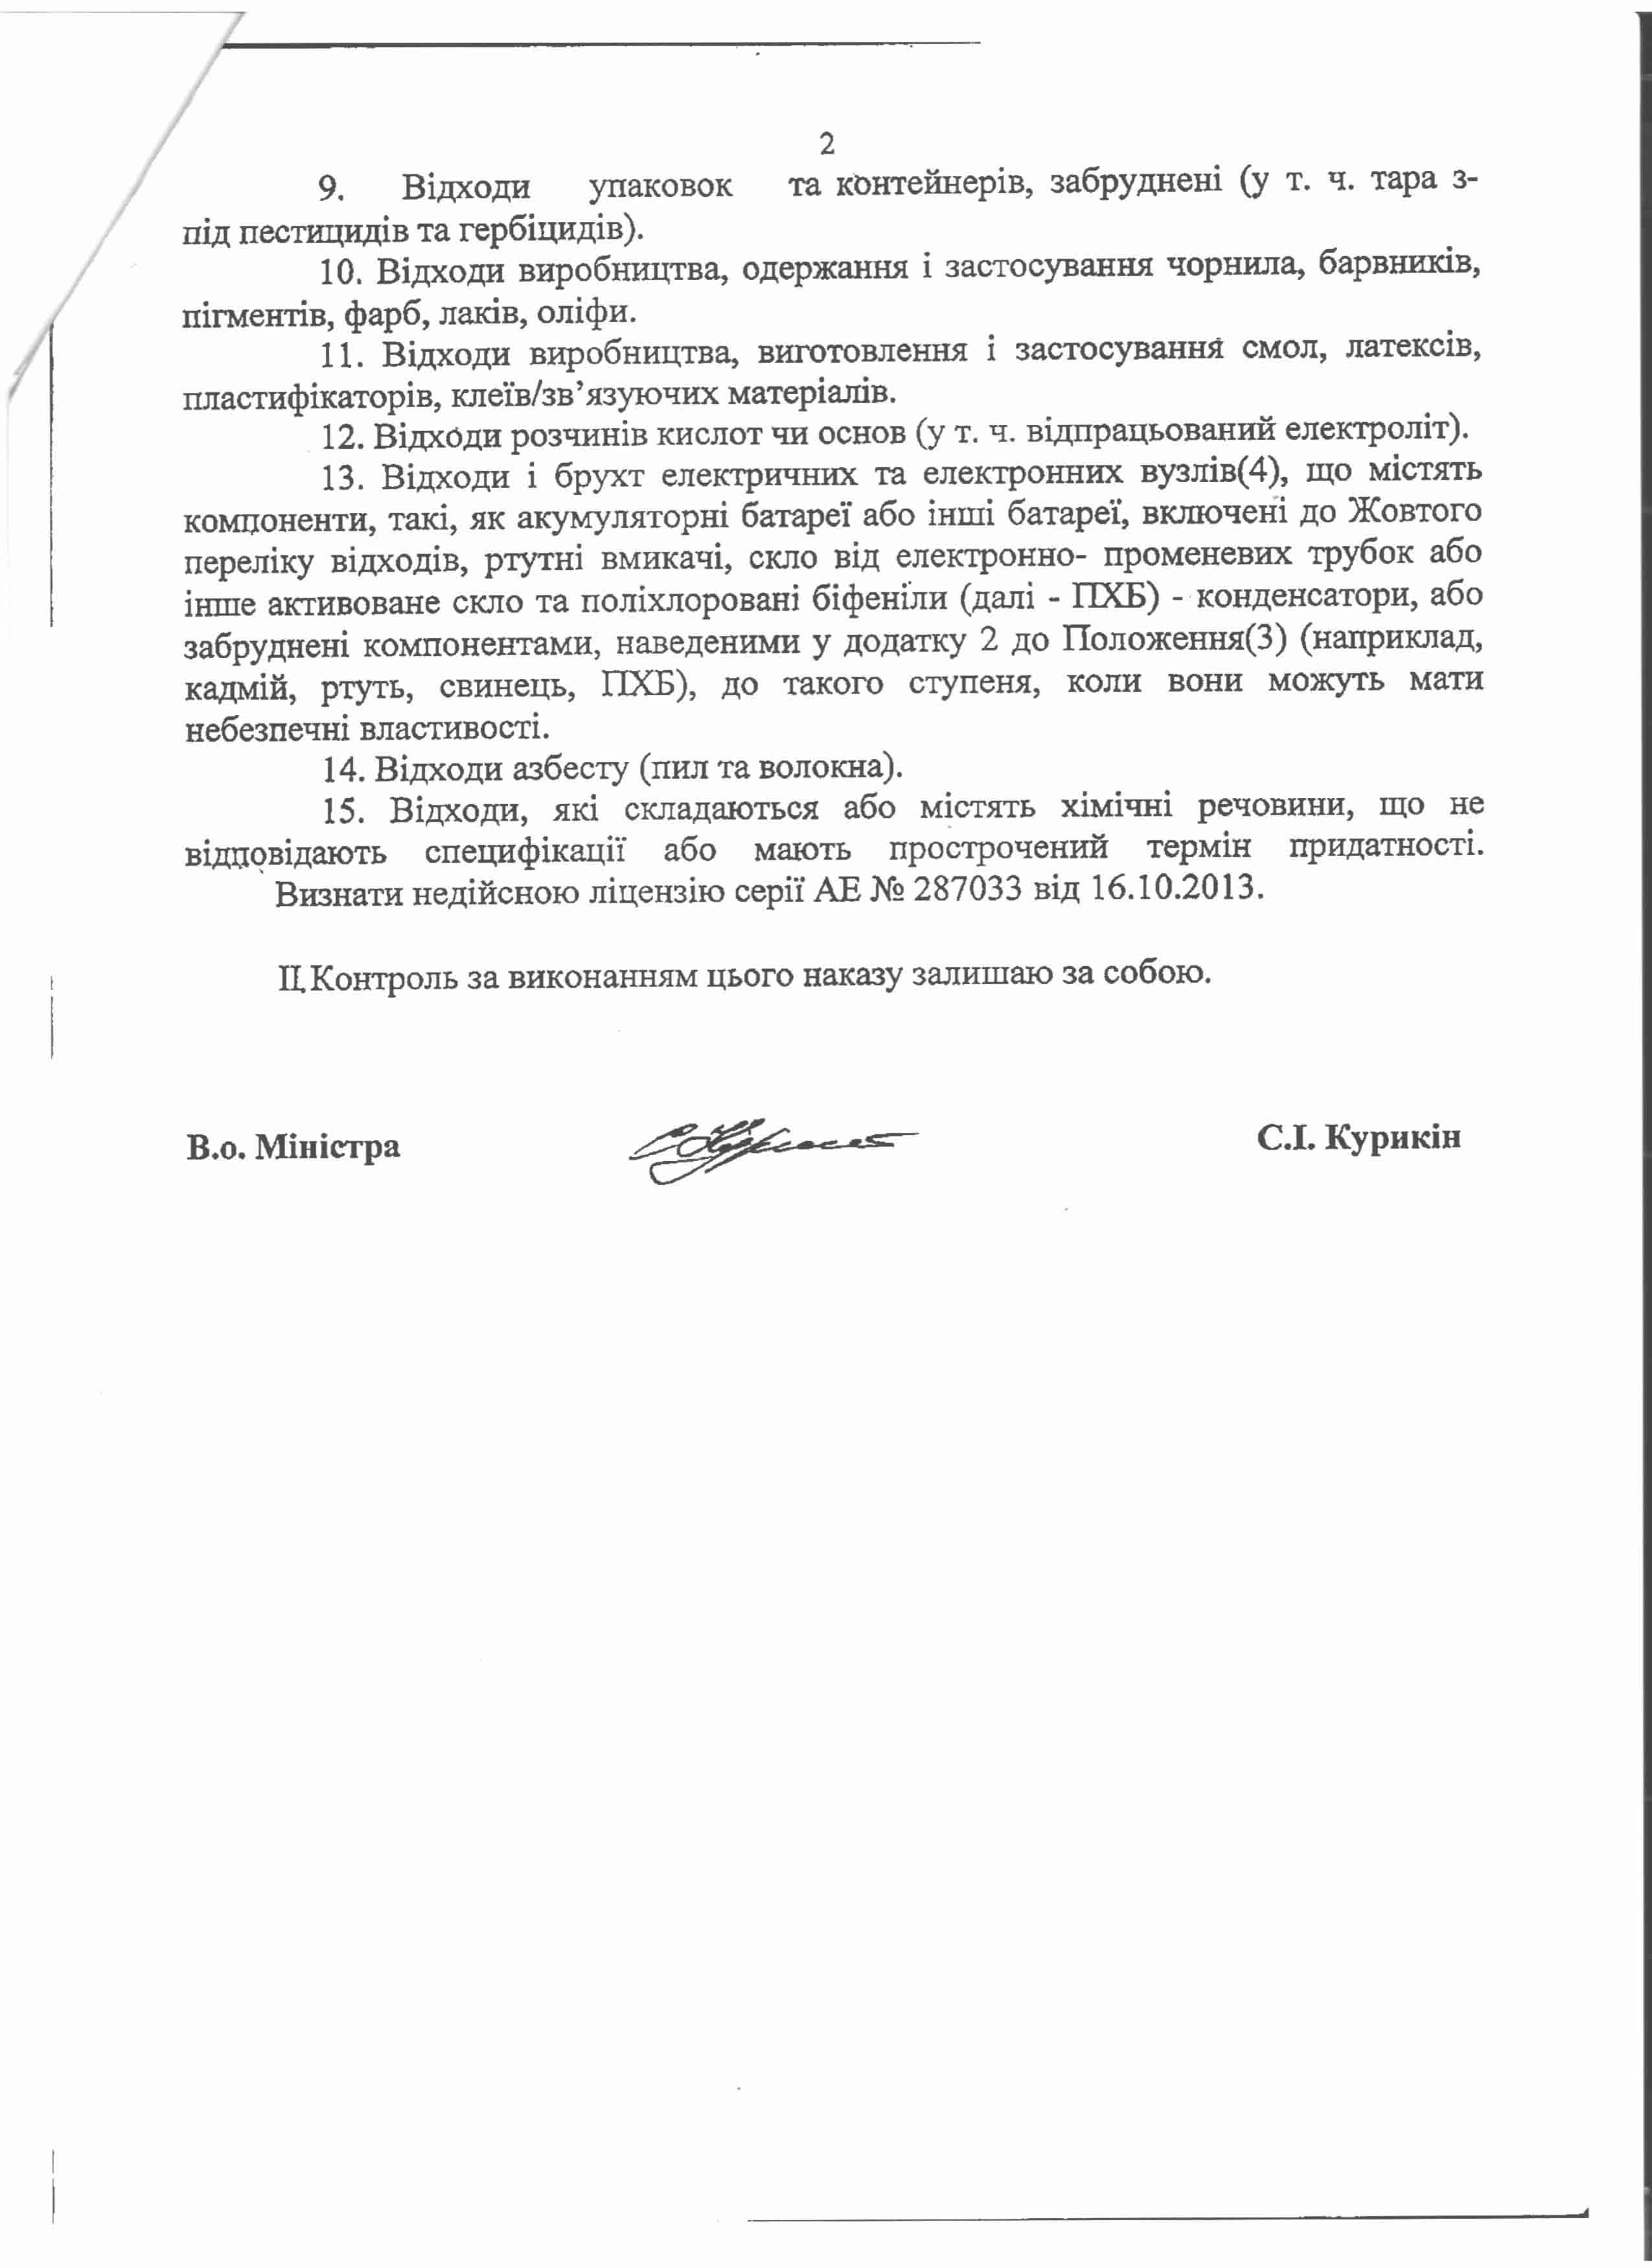 Приказ Минприроды Украины от 09.11.2015 г.№430